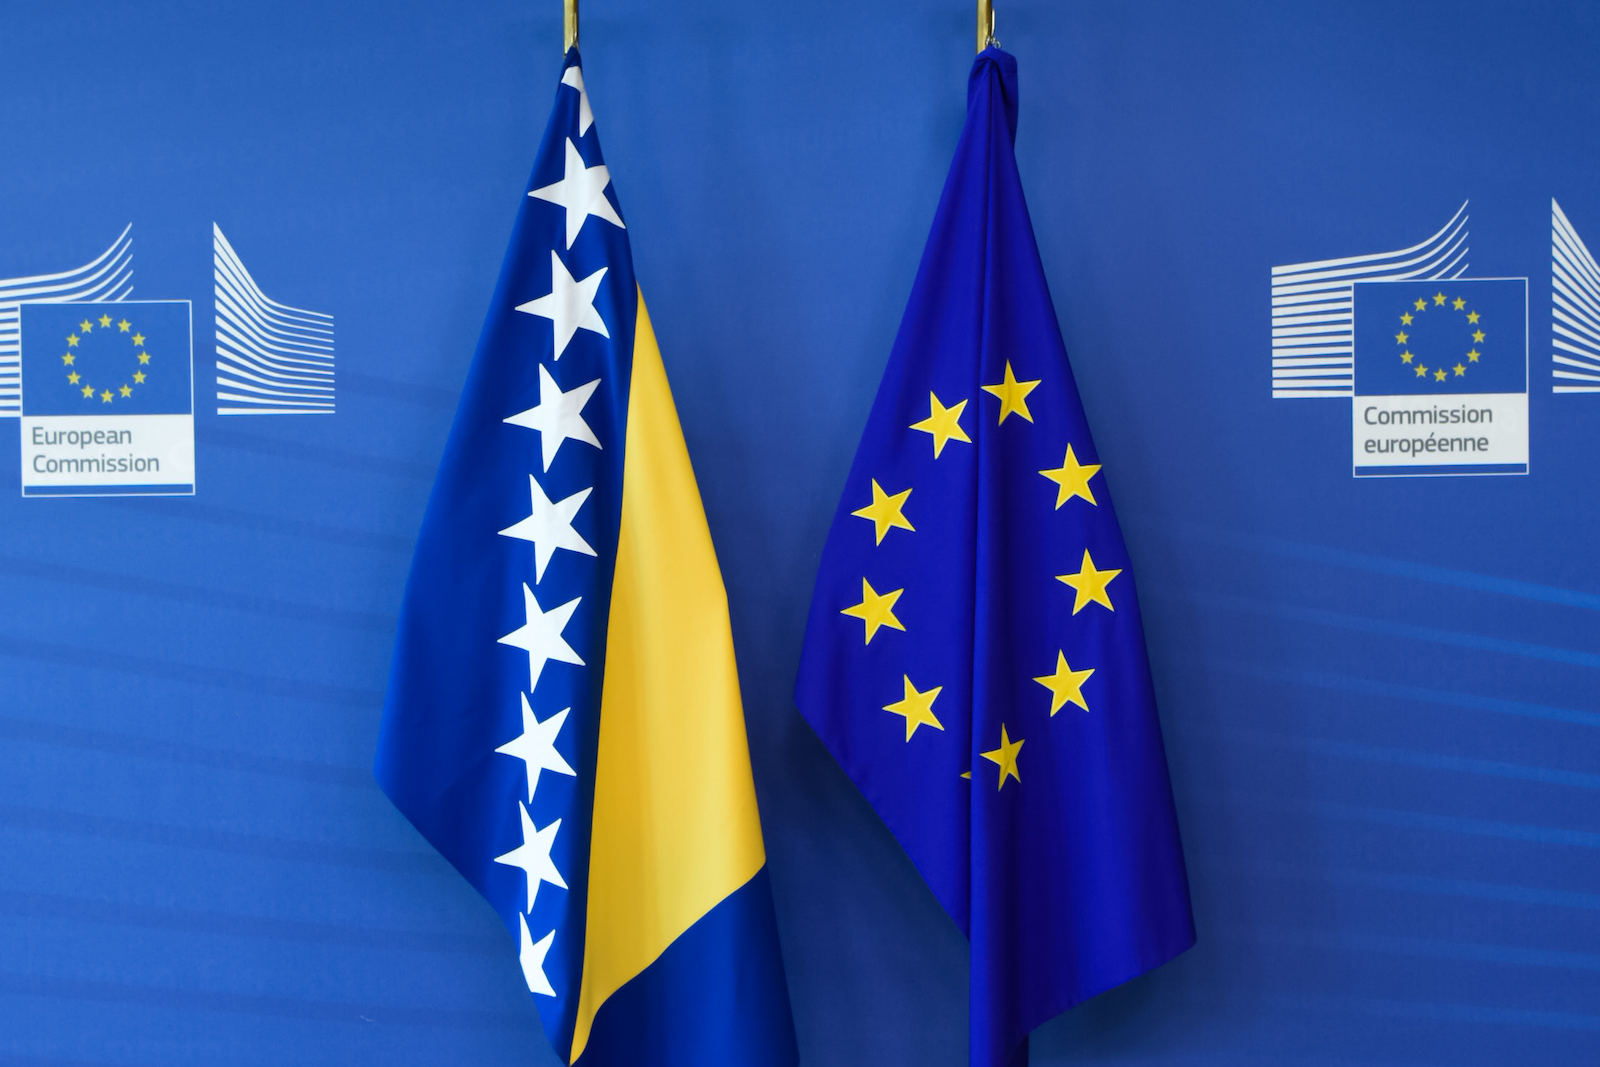 BiH: International organizations issue joint OP/ED on Dayton Agreement anniversary